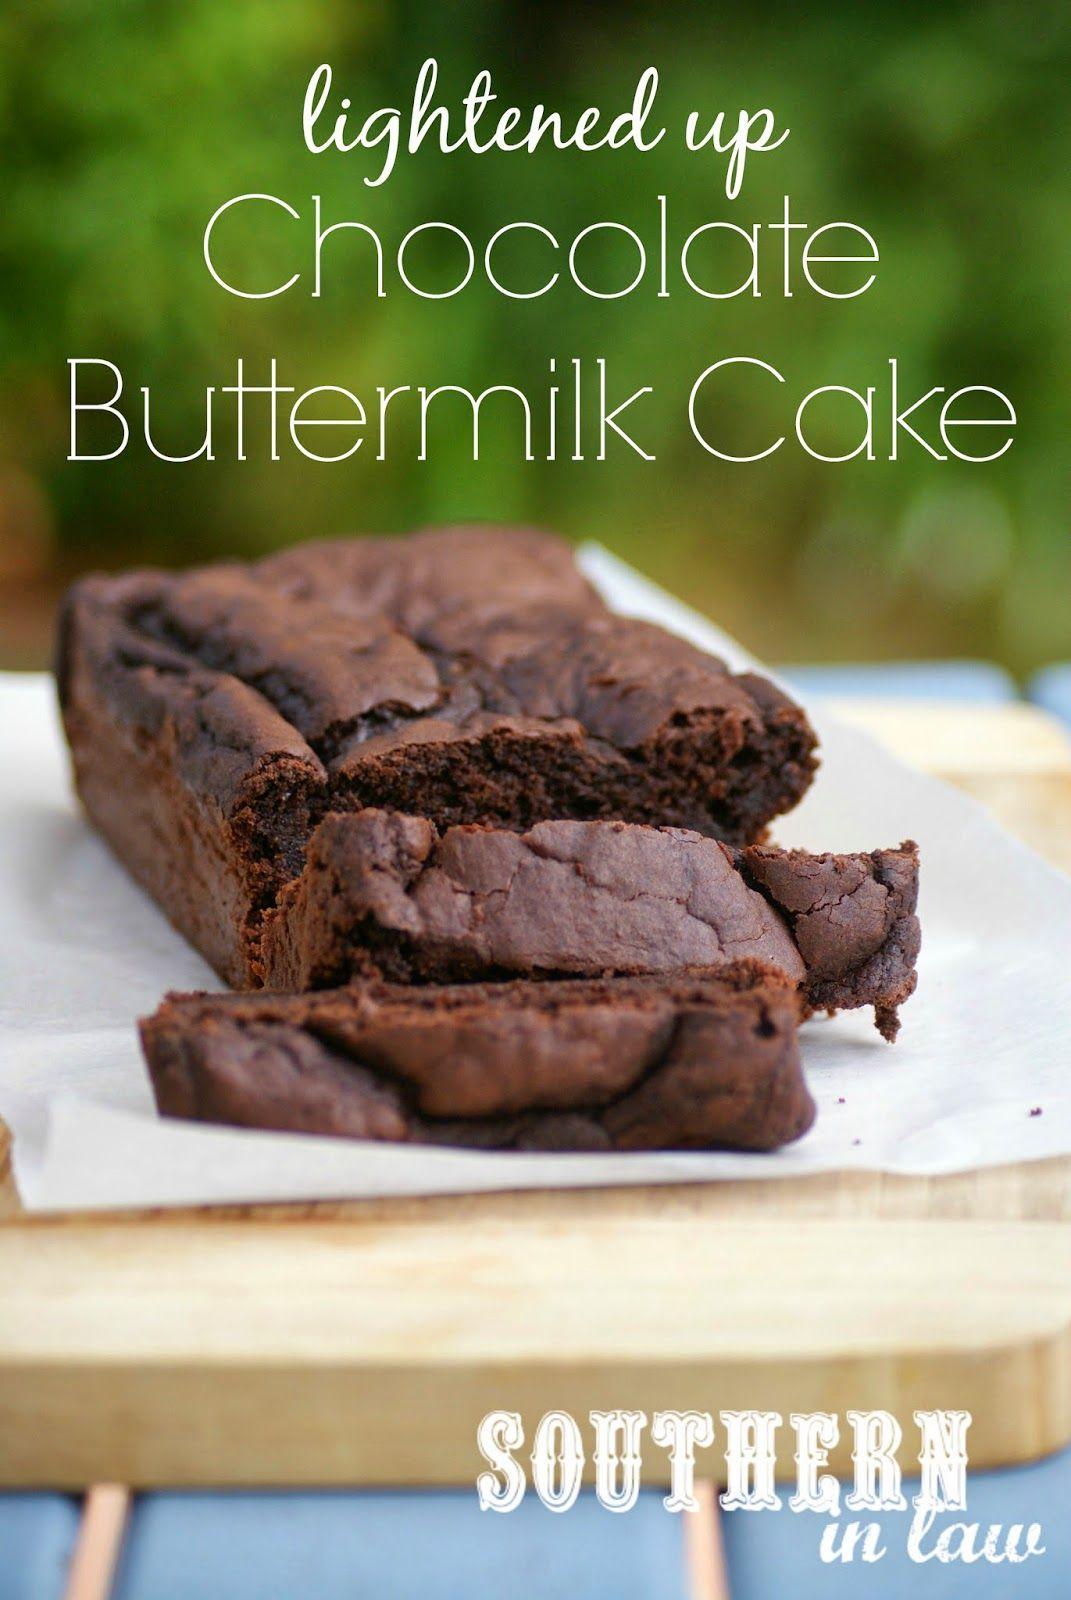 Recipe Lightened Up Chocolate Buttermilk Cake Buttermilk Chocolate Cake Buttermilk Recipes Healthy Chocolate